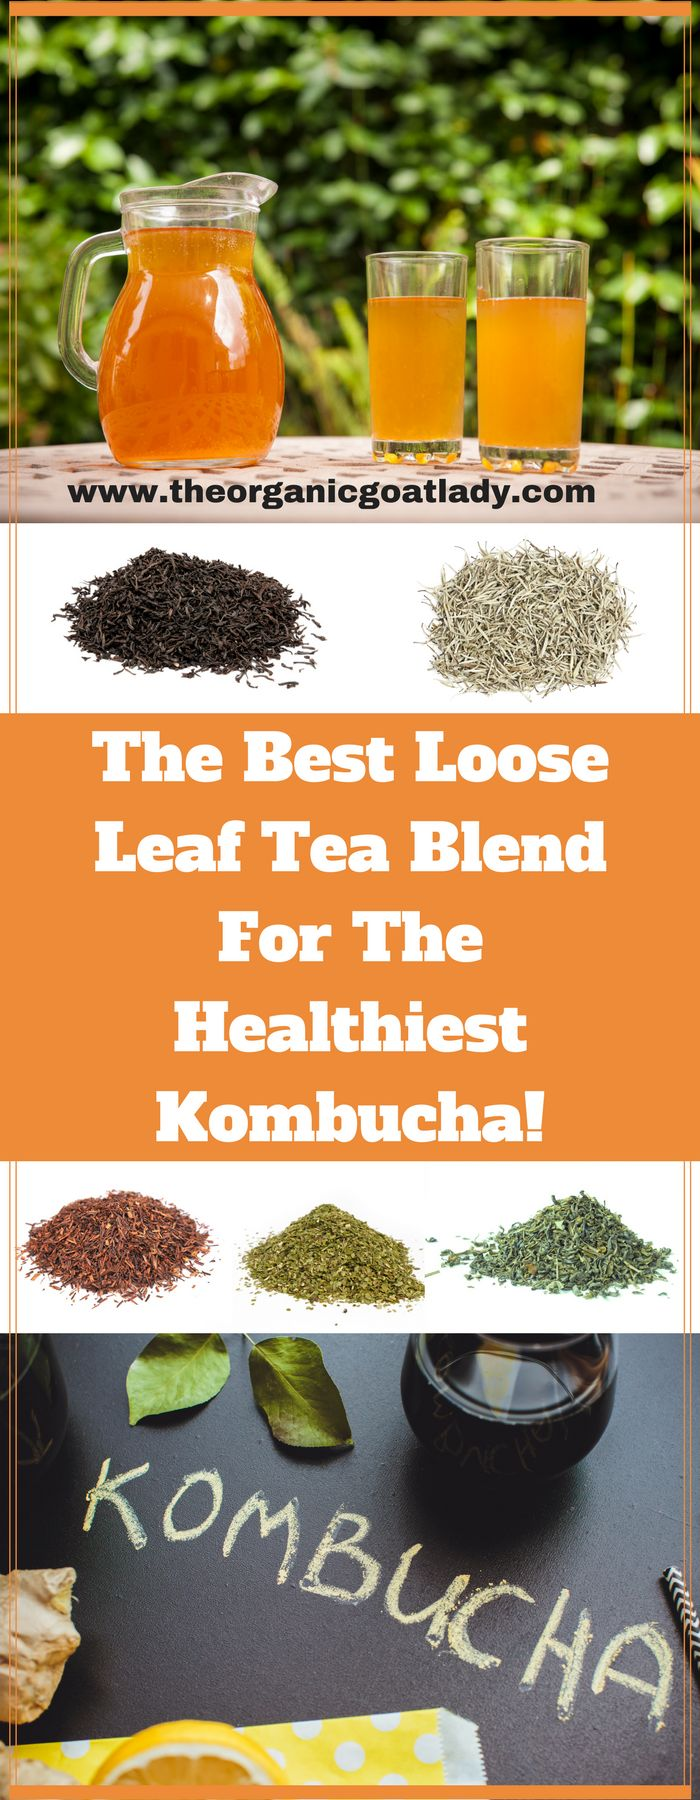 The Best Tea Blend For The Healthiest Kombucha!